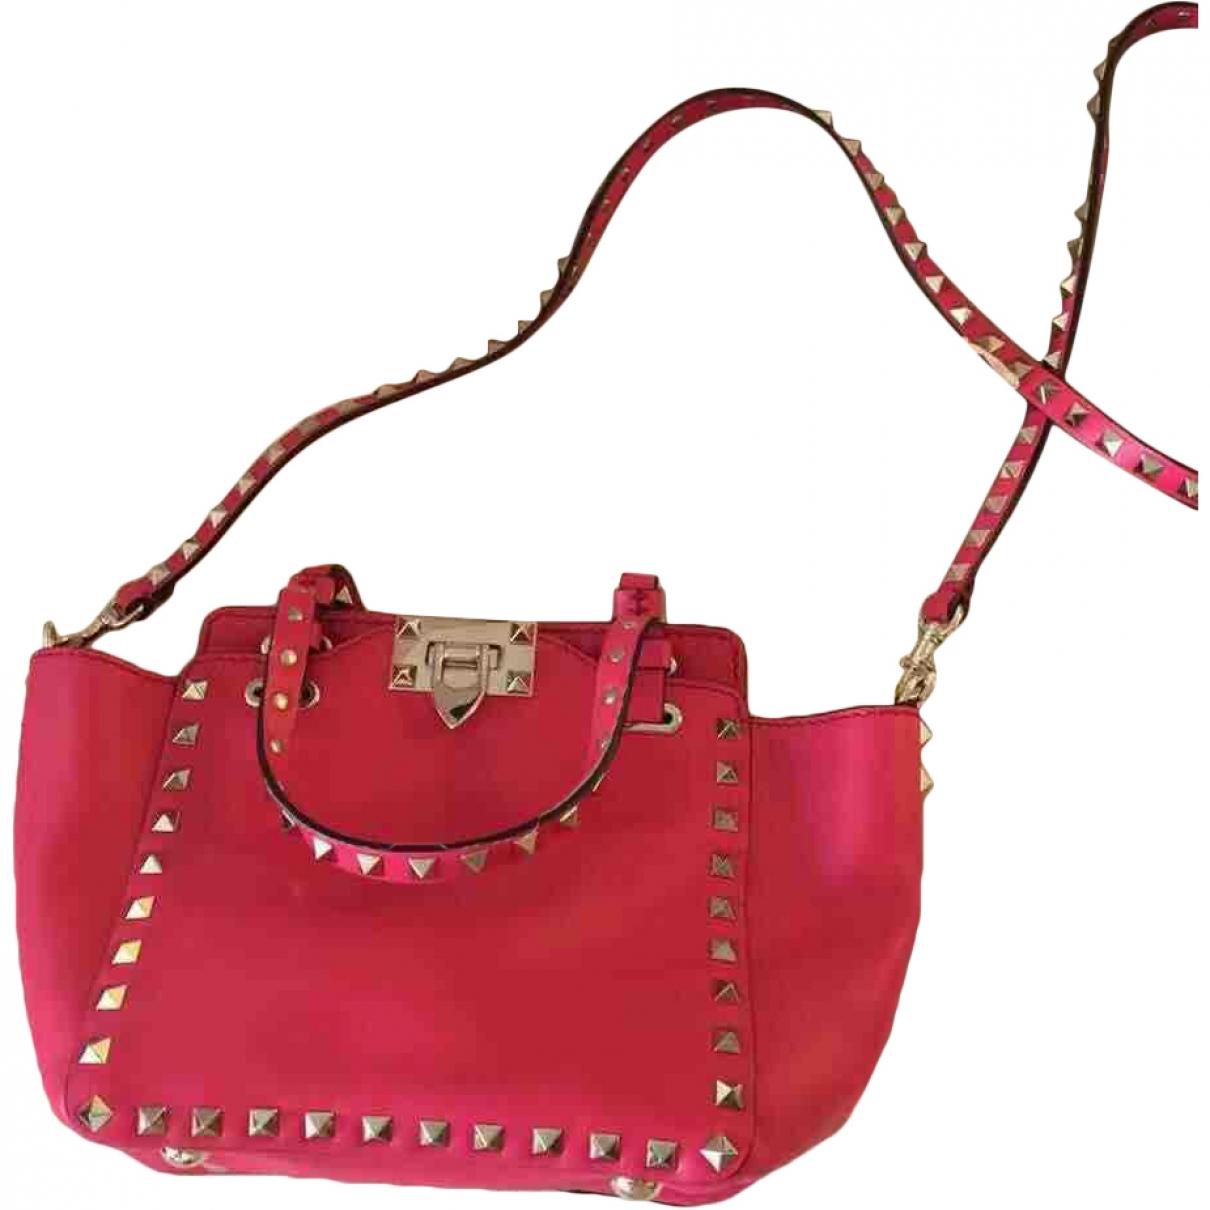 Valentino Garavani Rockstud Handtasche in  Rosa Leder